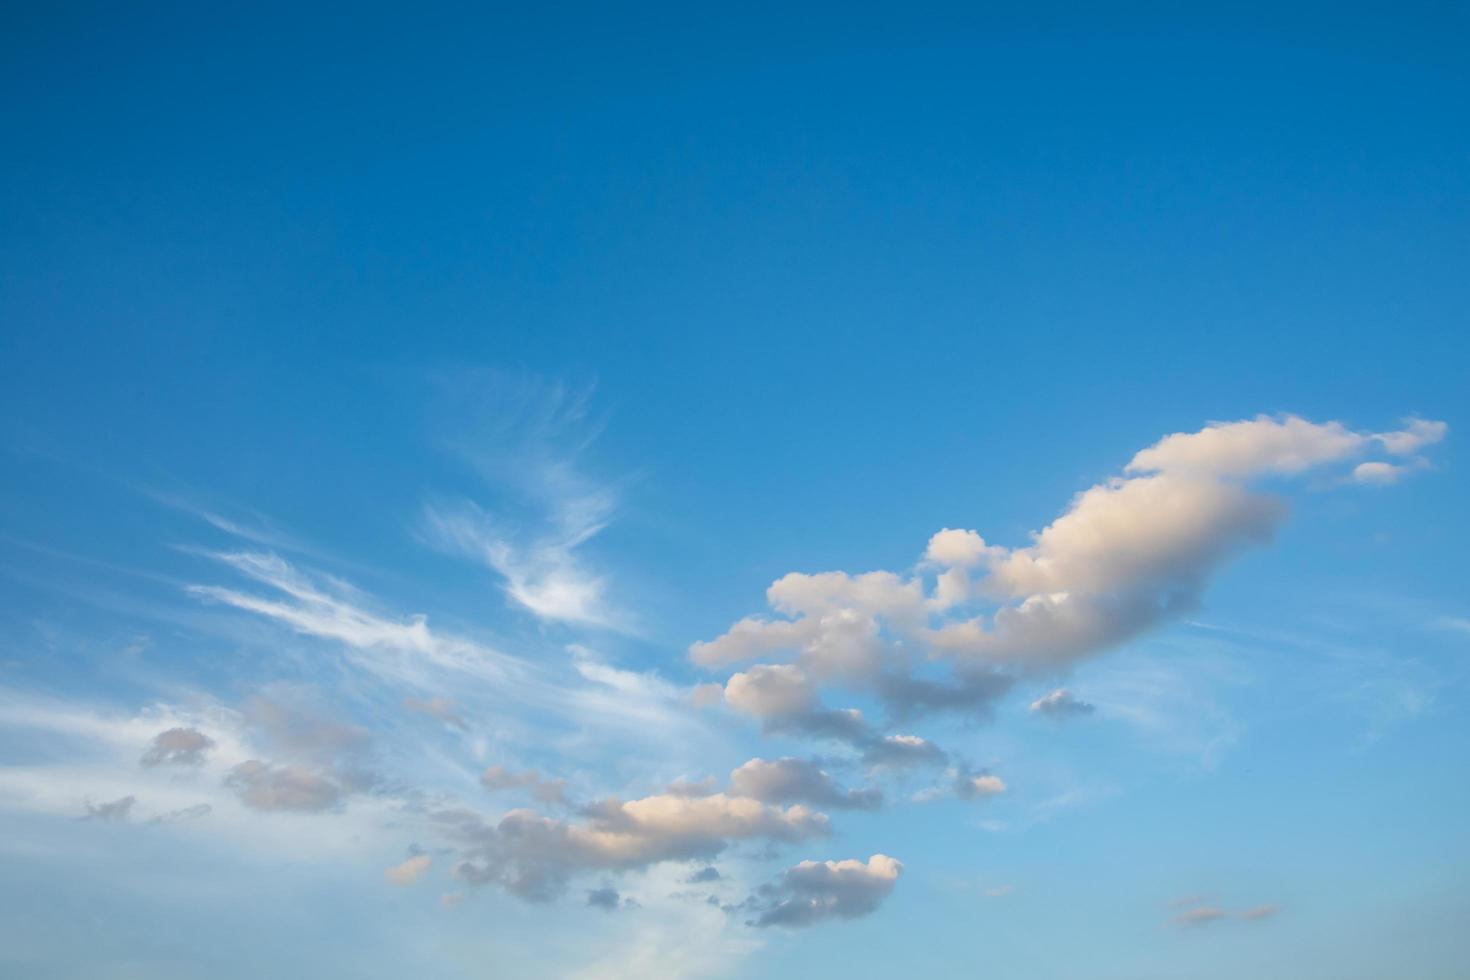 nuvole in un cielo blu foto